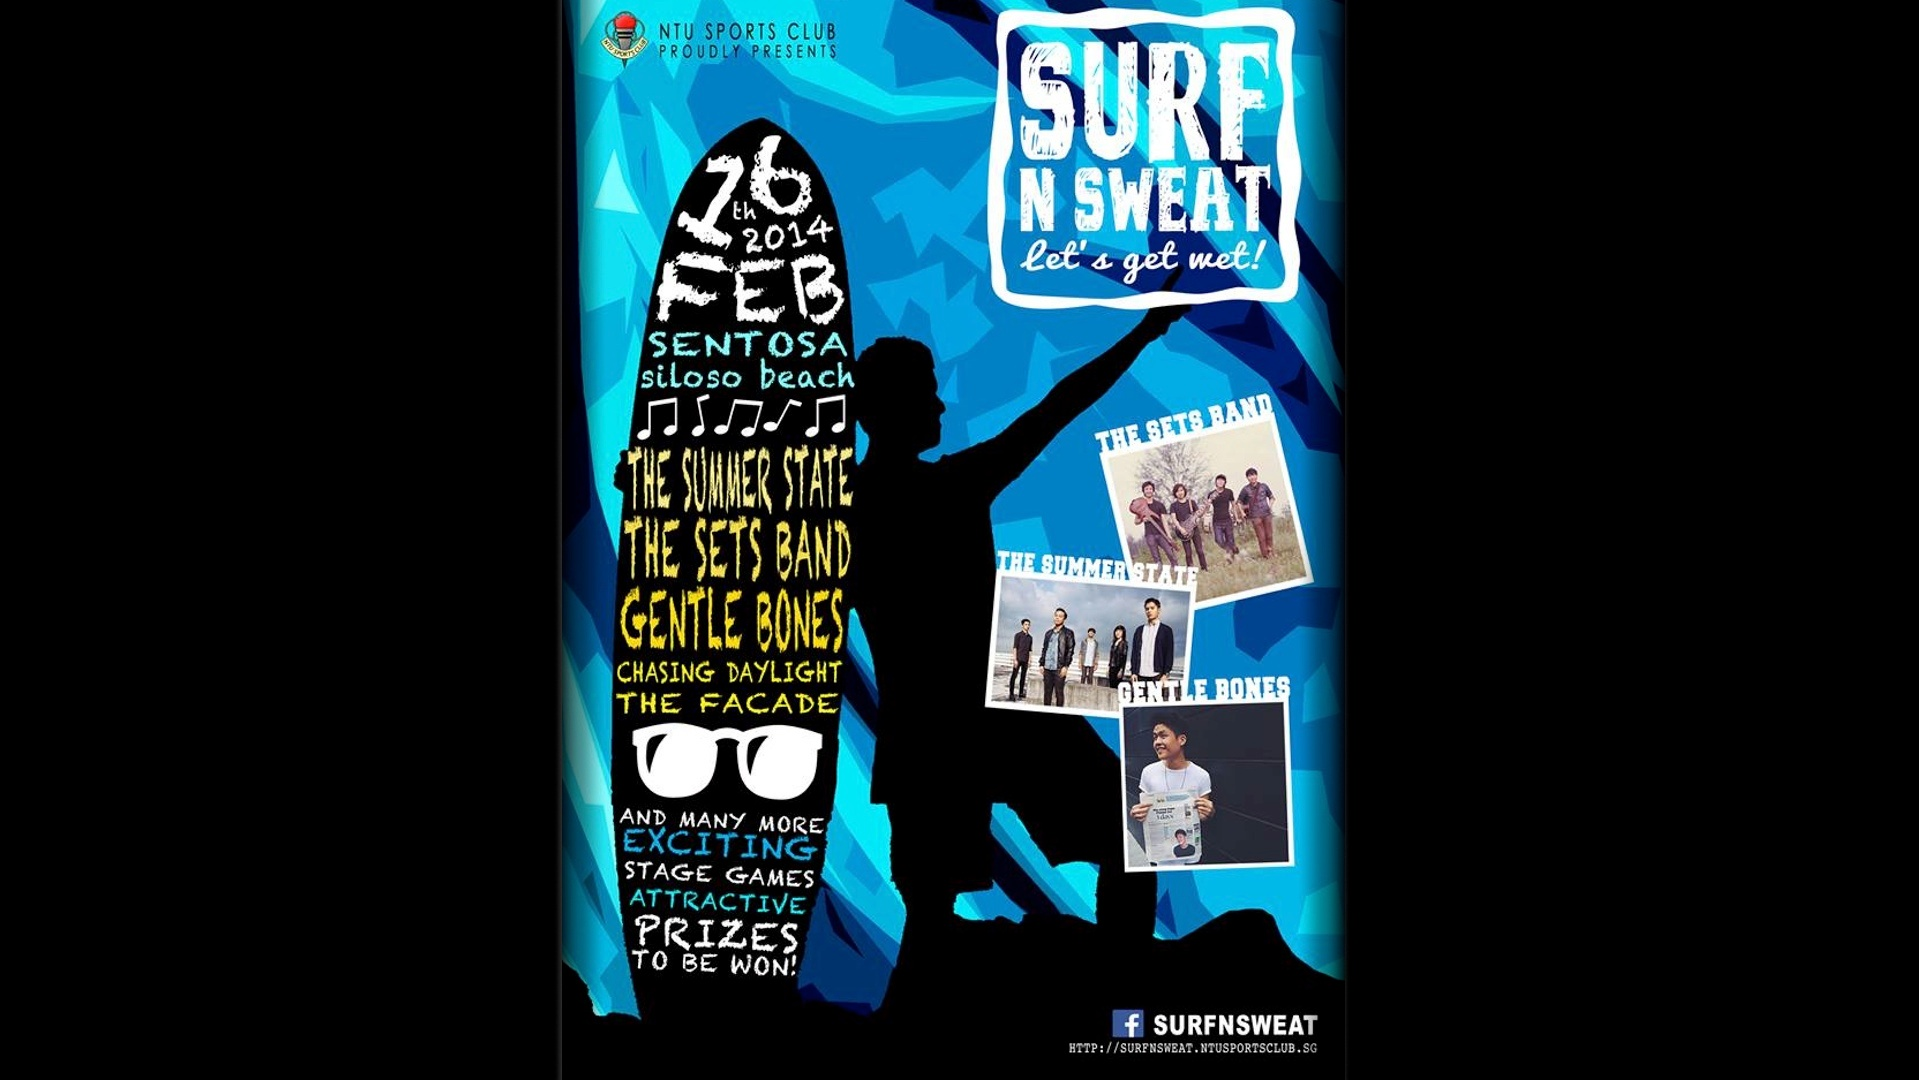 Surf N Sweat